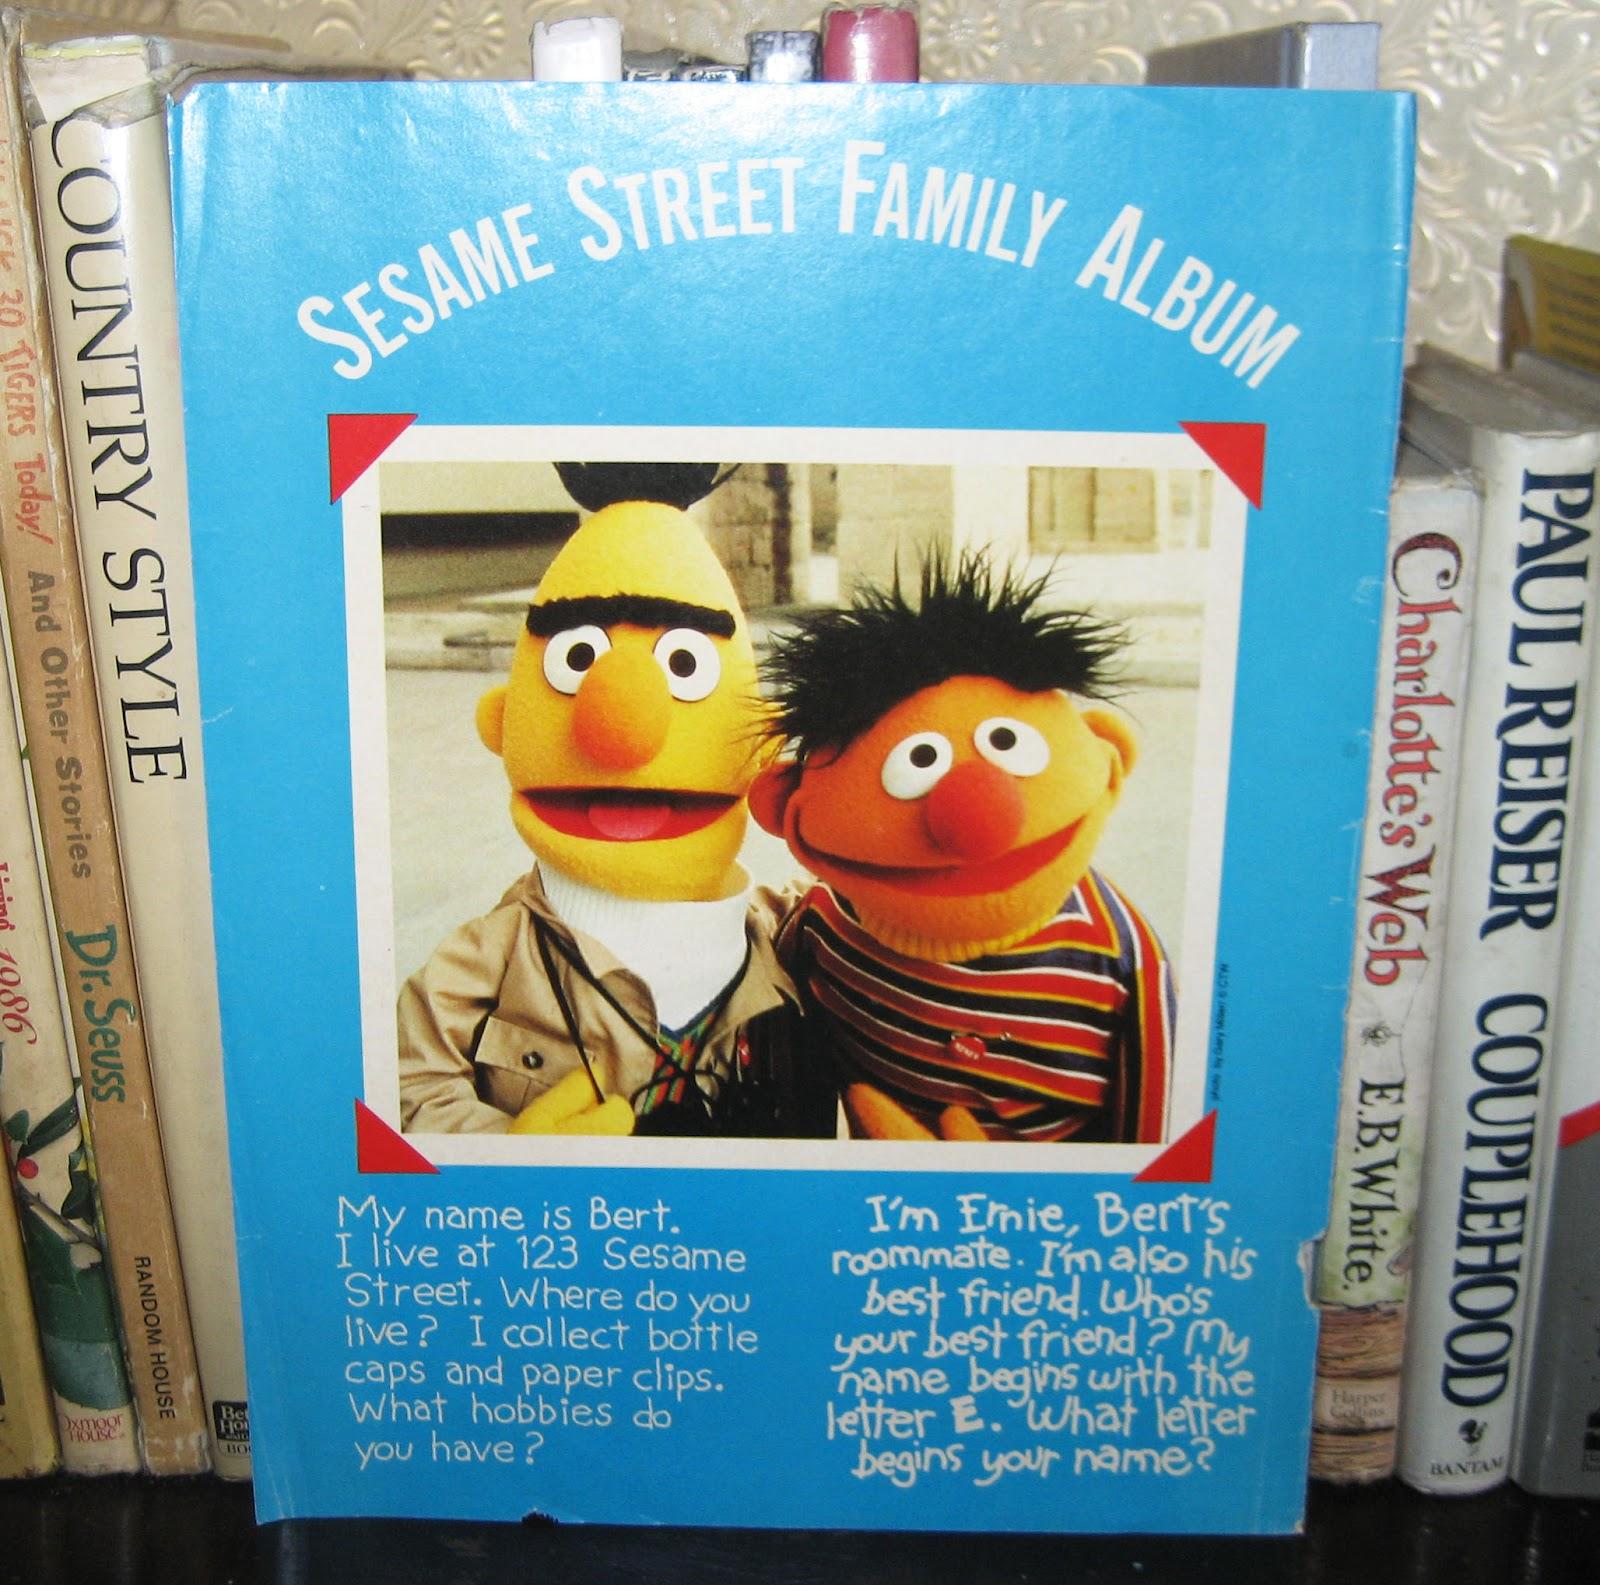 Percy S Memorabilias Bert And Ernie Sesame Street Family